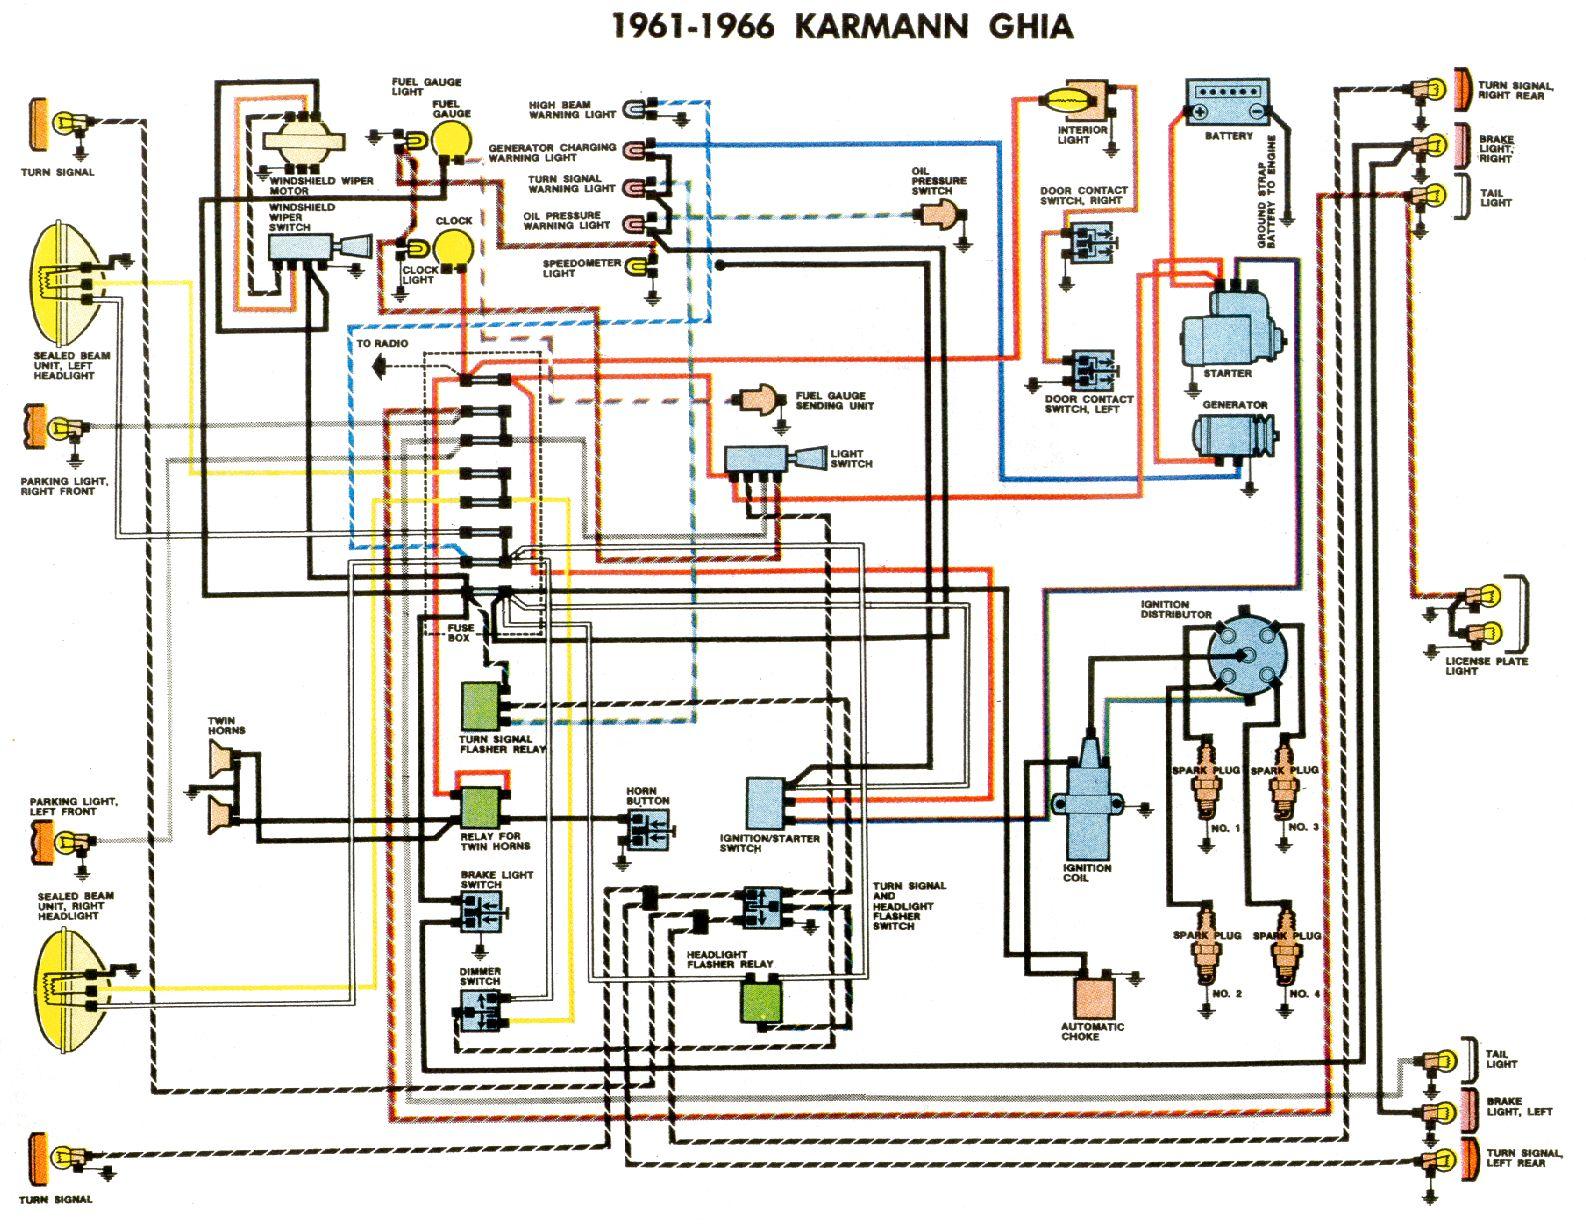 585010?resize\\\\\\\\\\\\\\\=665%2C513\\\\\\\\\\\\\\\&ssl\\\\\\\\\\\\\\\=1 amazing 914 wiring diagram photos wiring schematic tvservice us rotax 912 wiring schematic at n-0.co